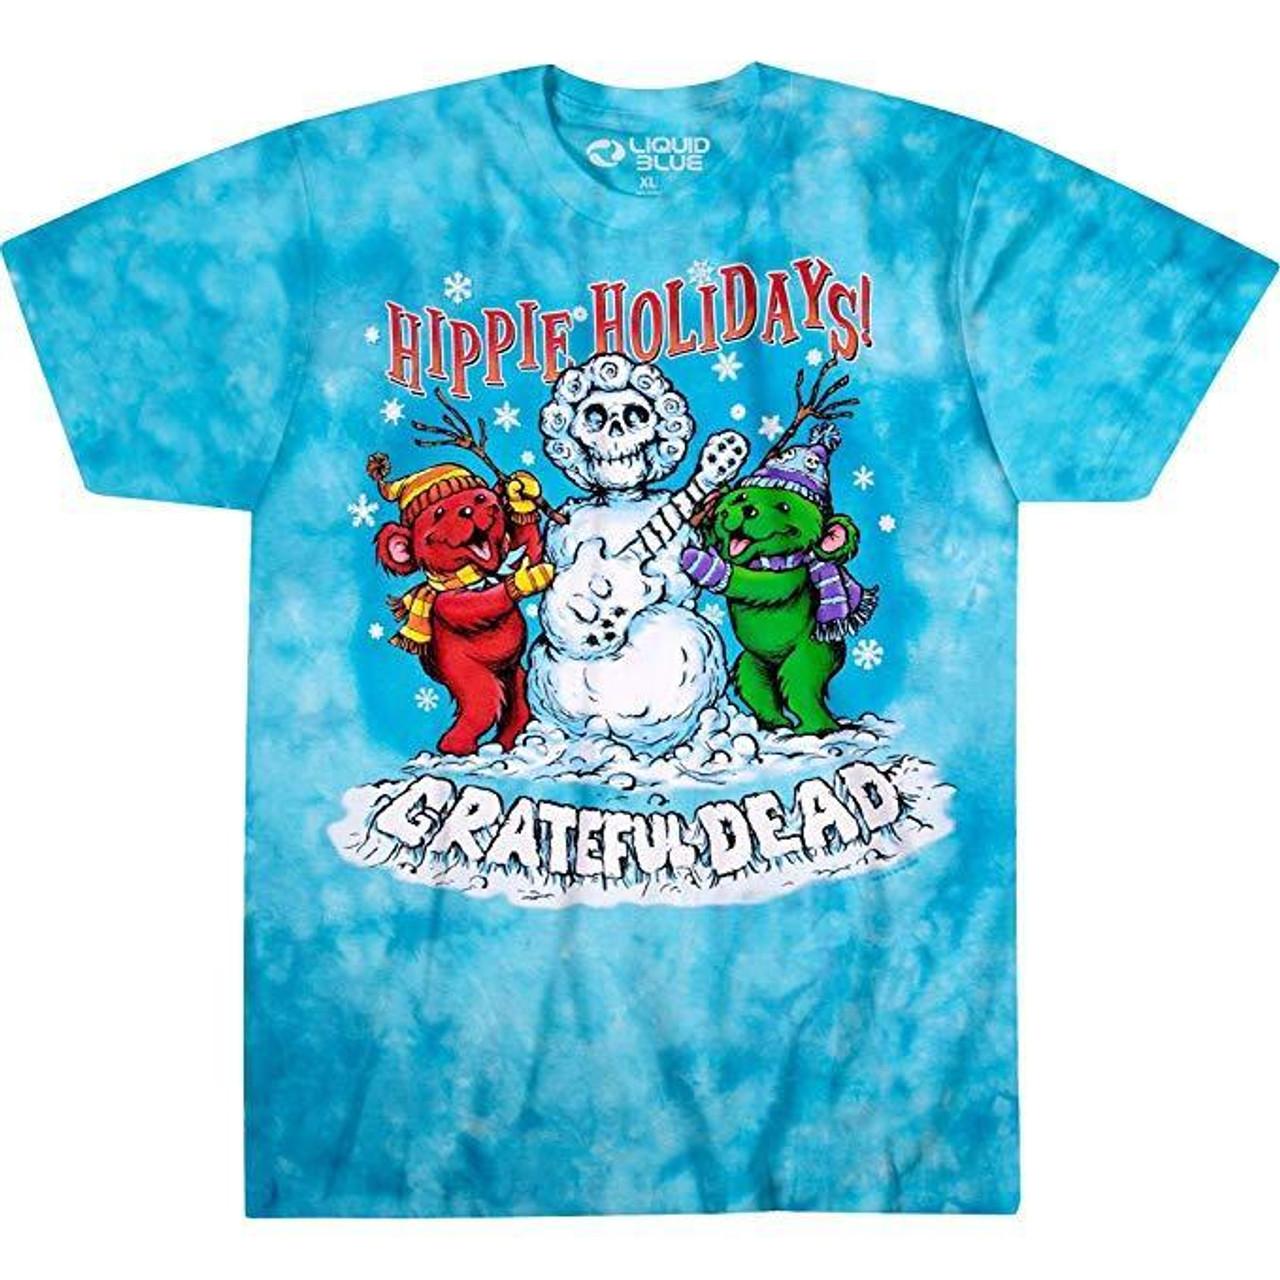 Grateful Dead Hippie Holiday Snowman Bears Classic Rock Music Band T